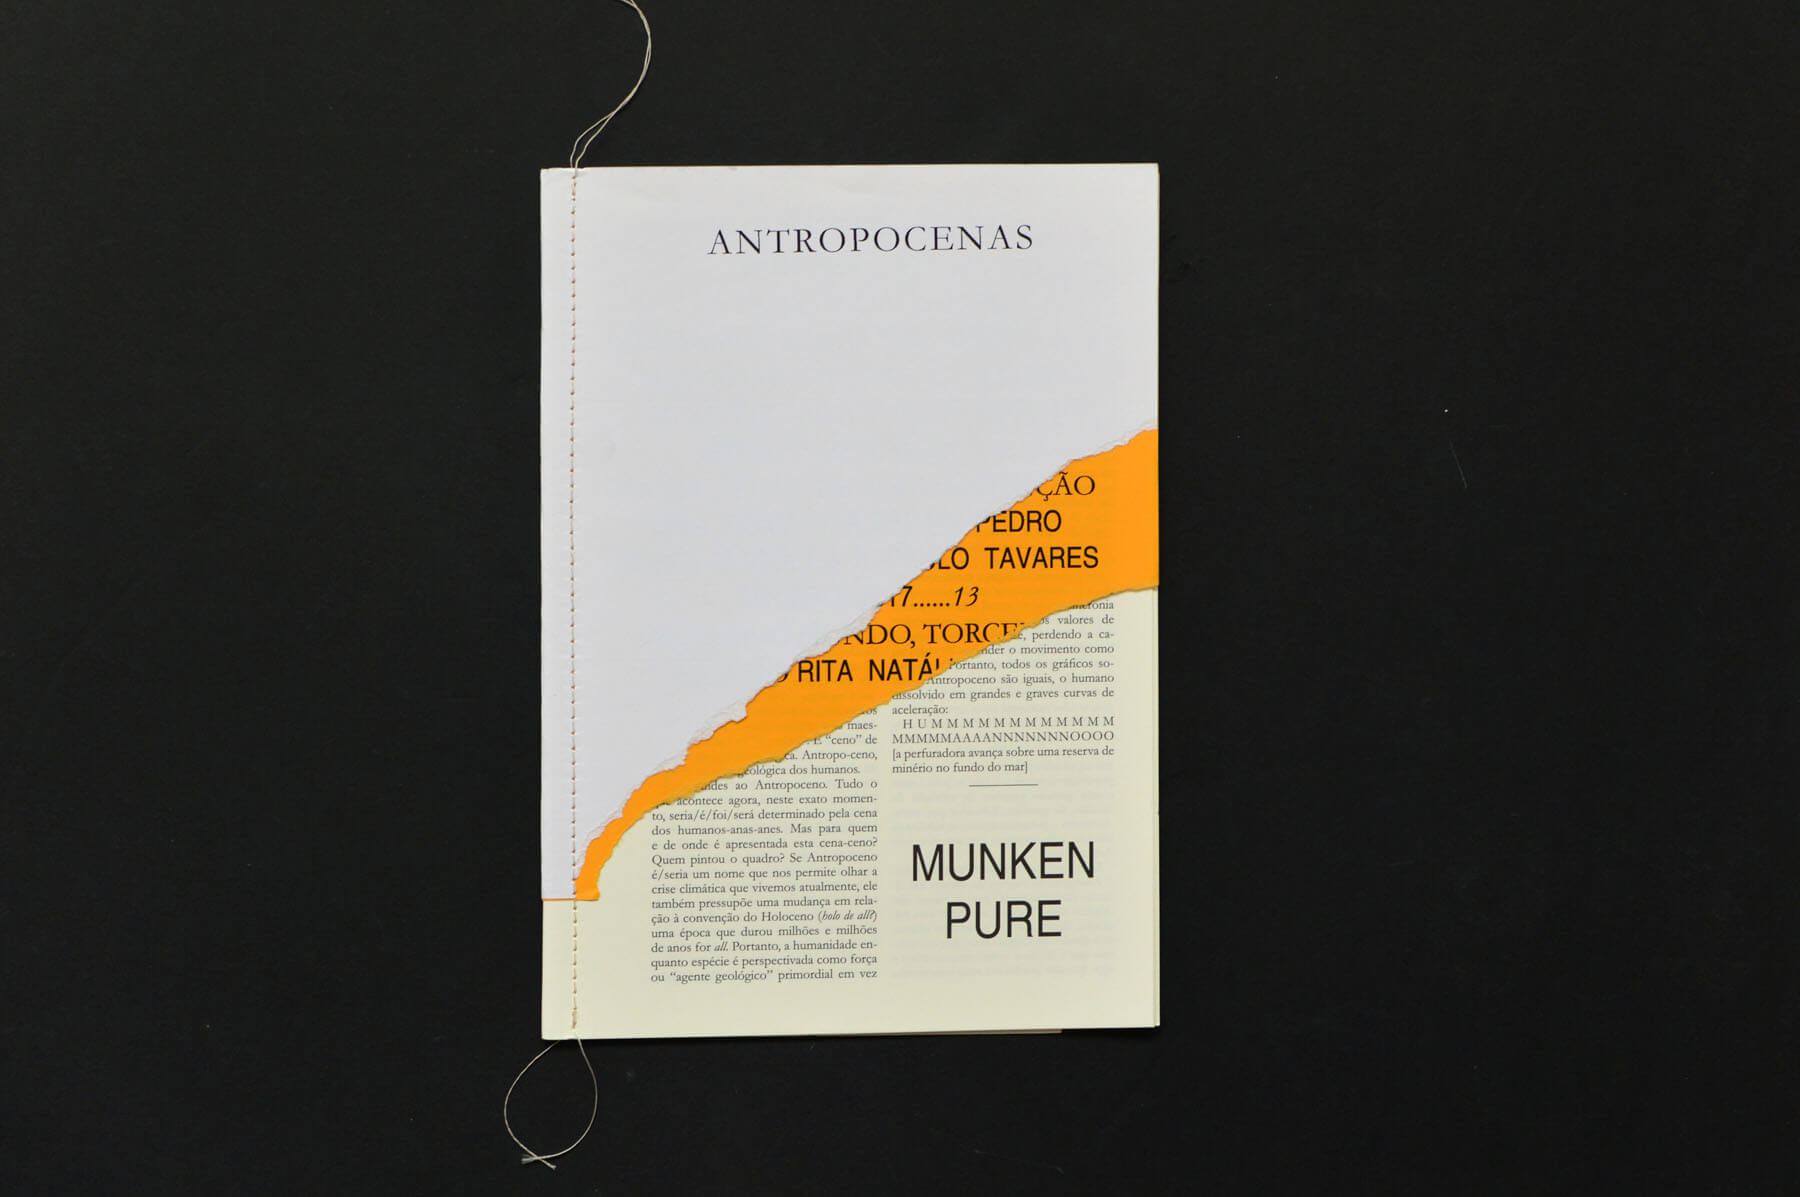 antropocenas isabel lucena 11